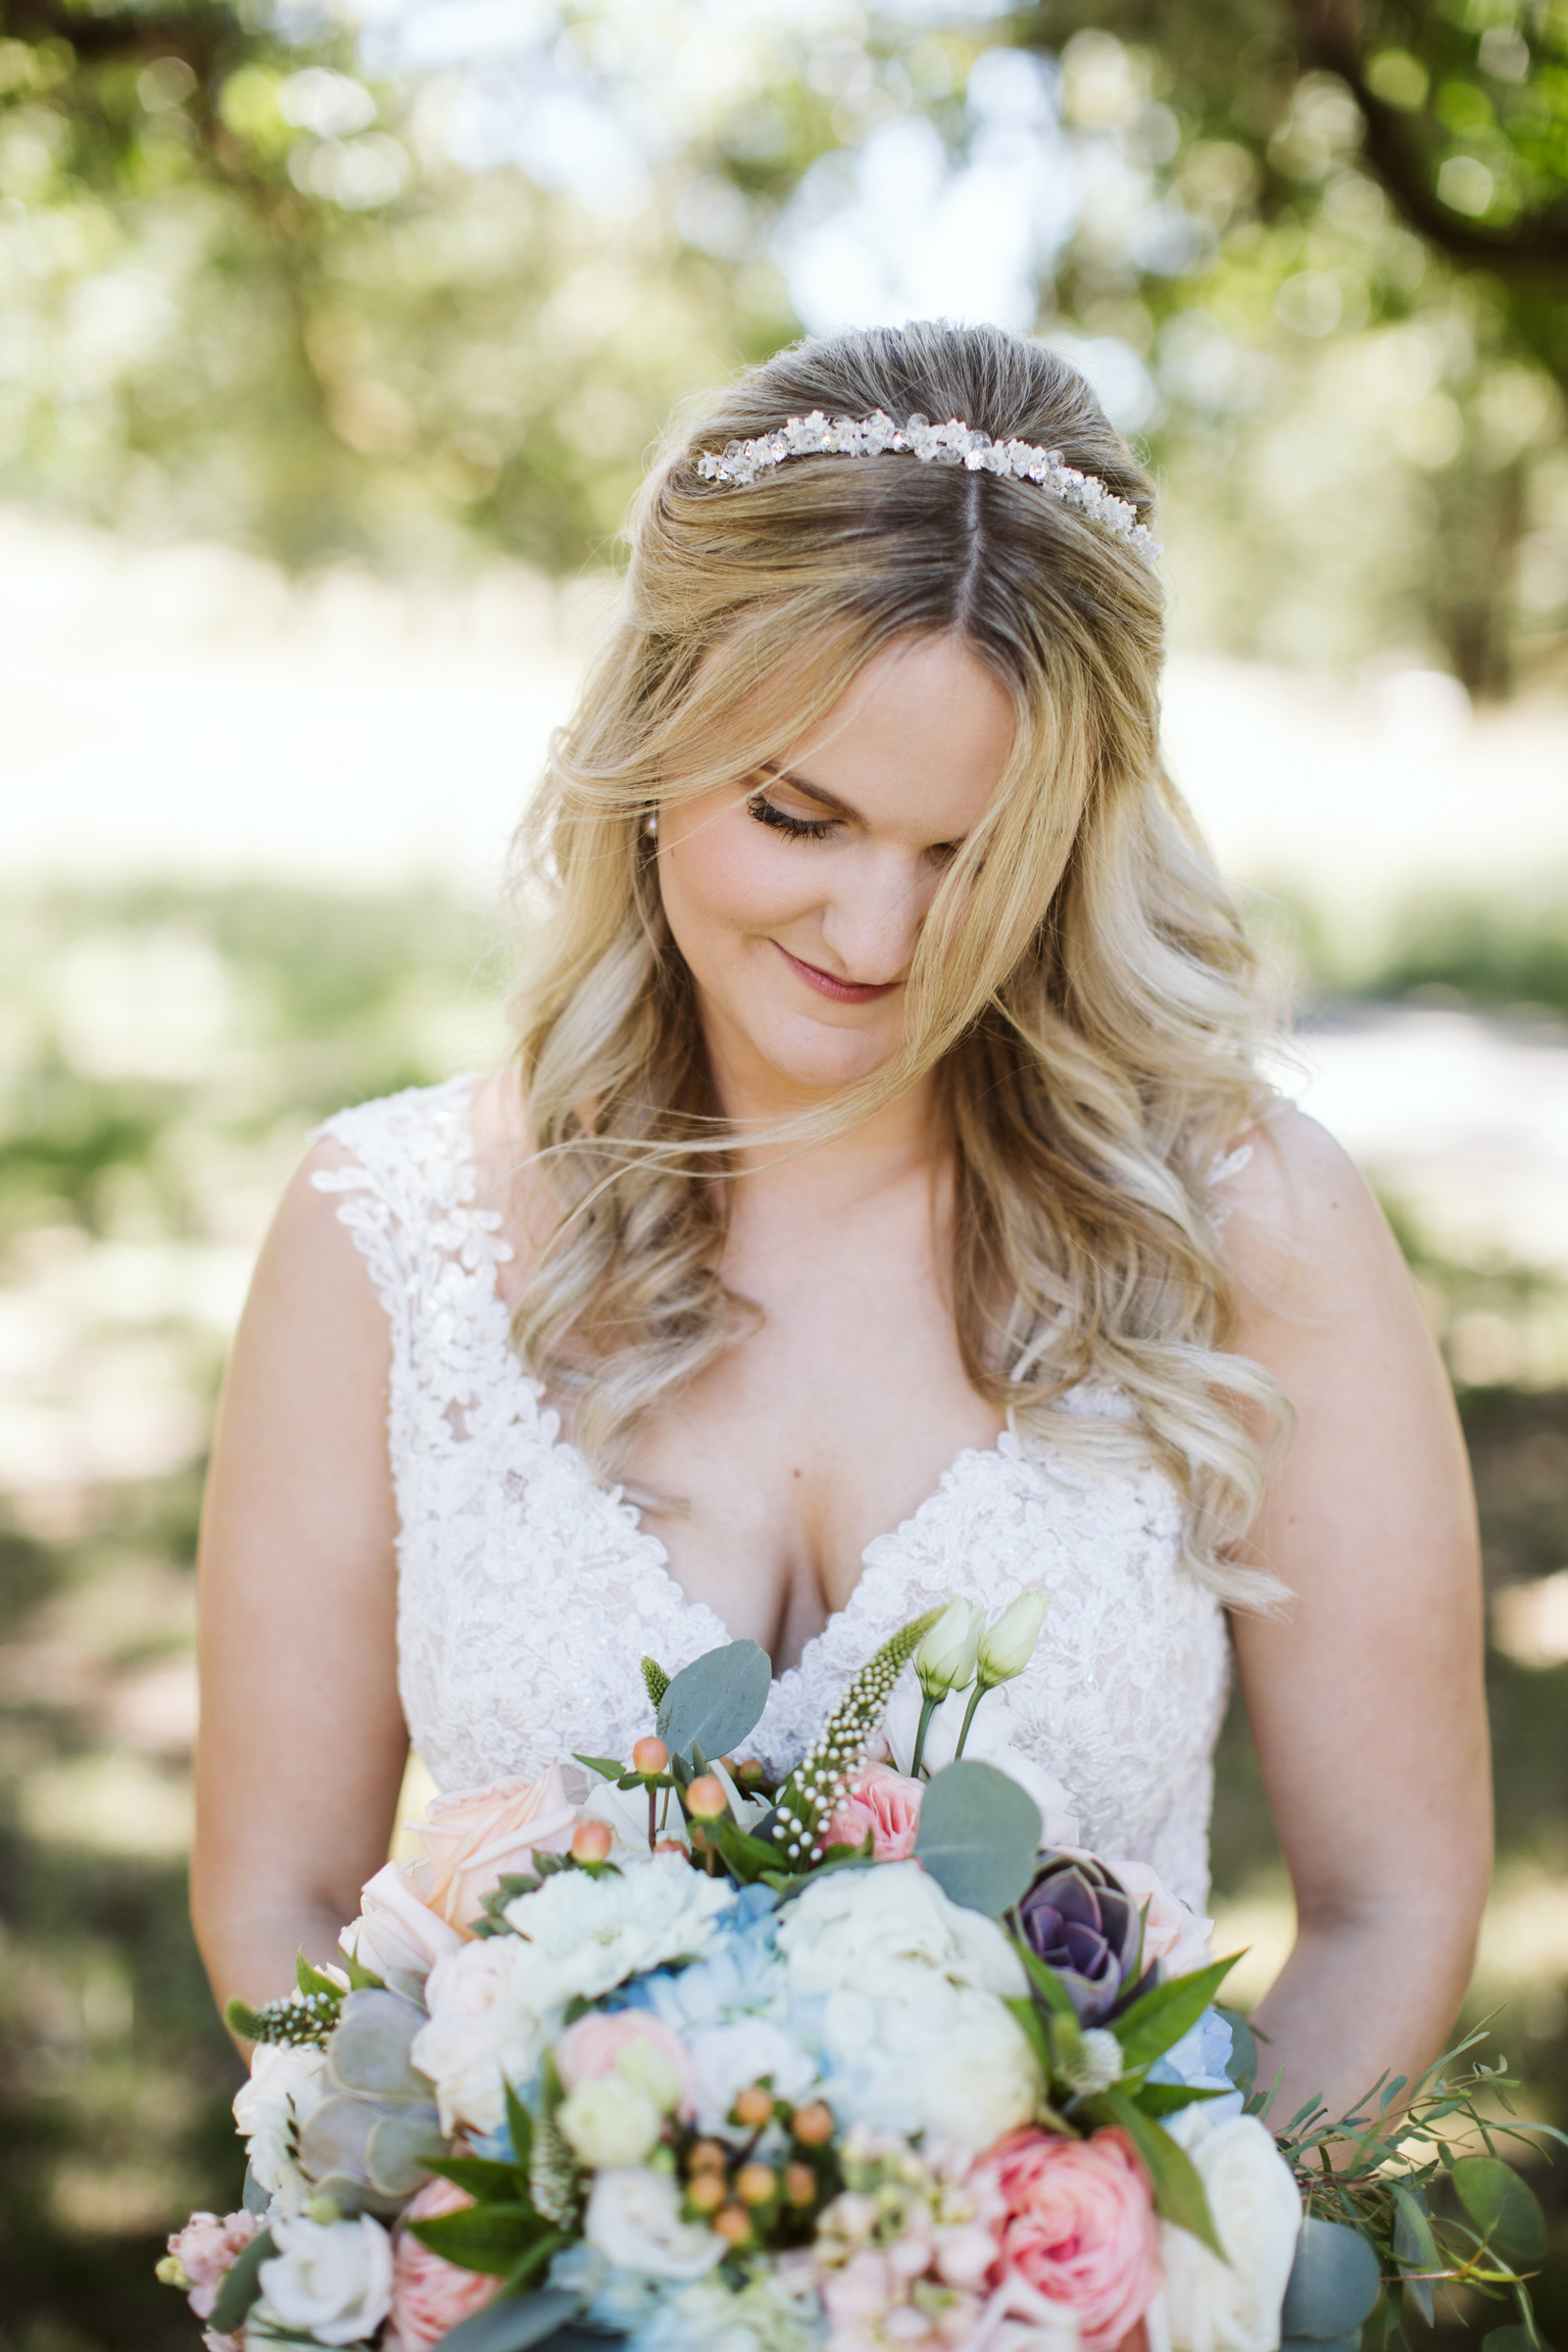 011-daronjackson-rachel-michael-wedding-mtpisgah.jpg